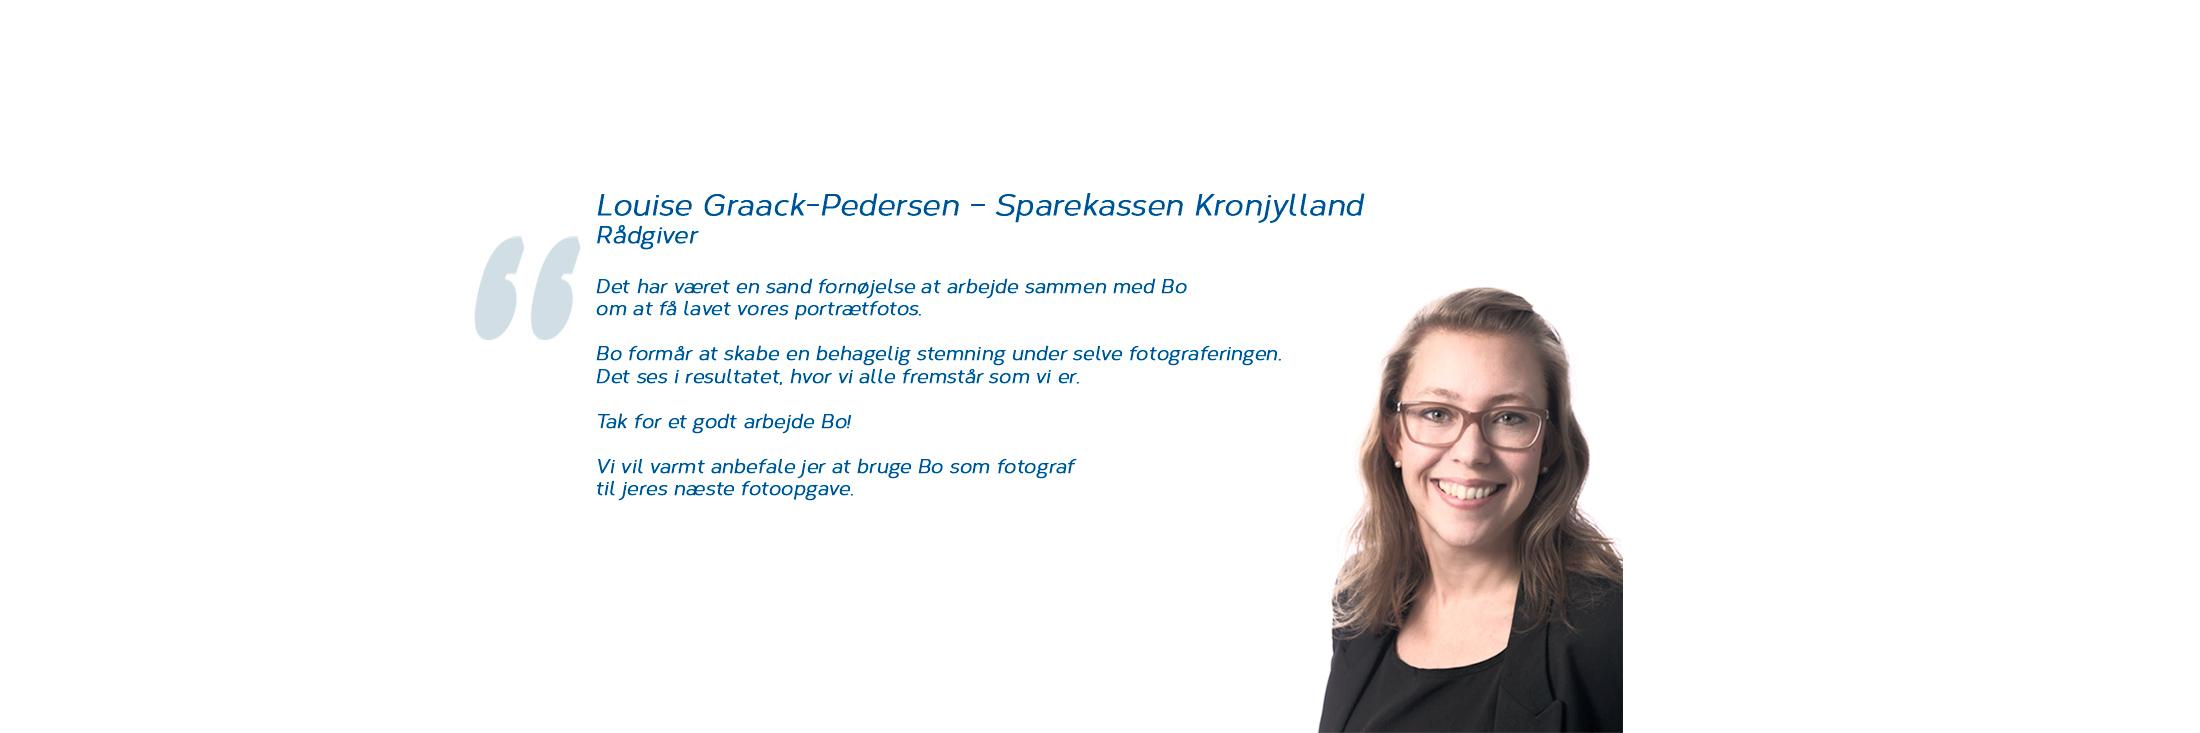 Louise Graack-Pedersen